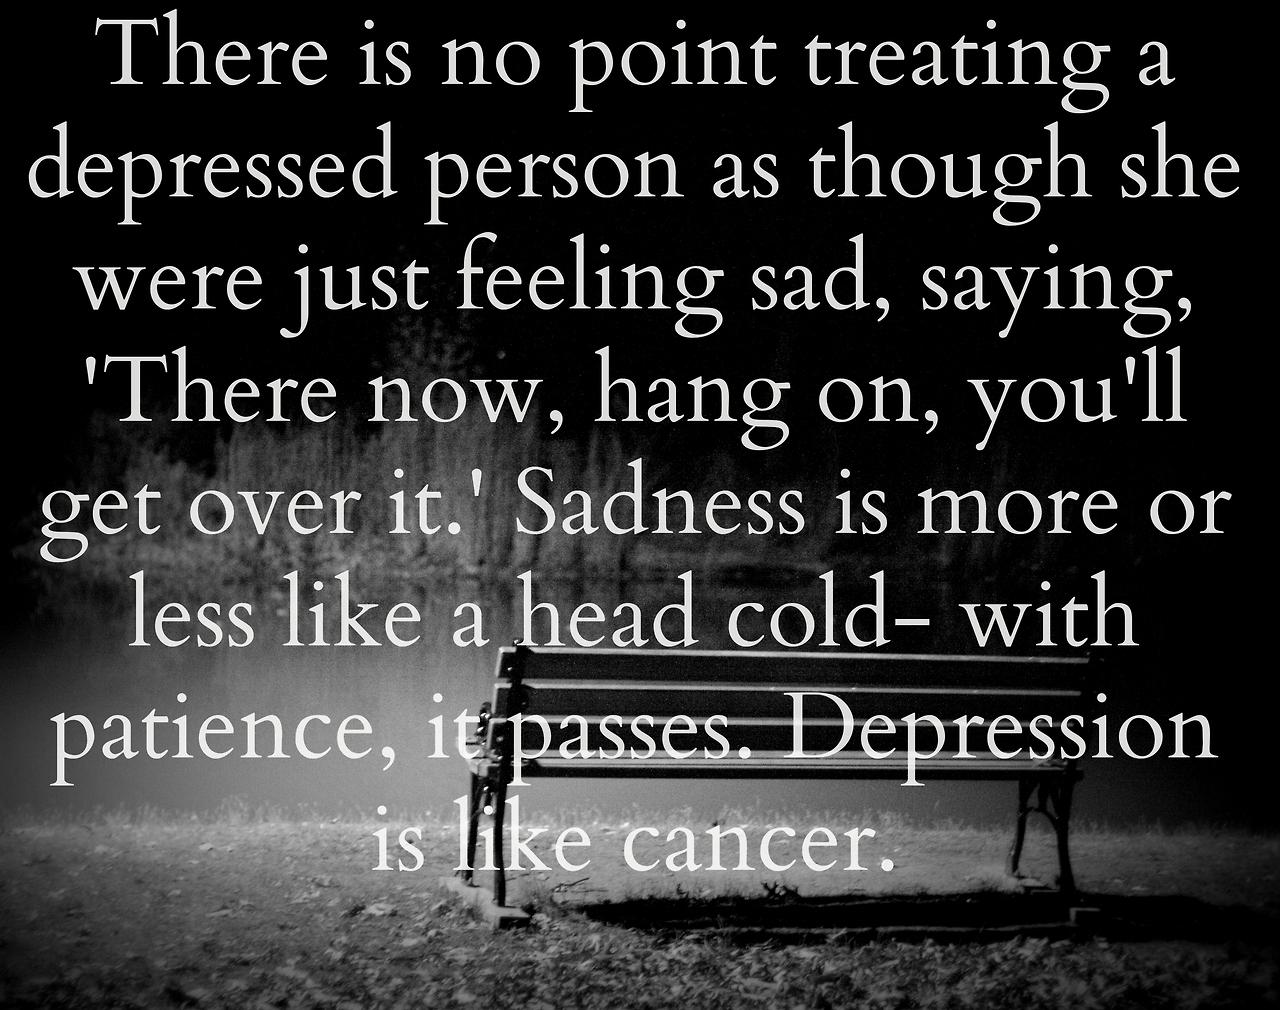 Overcoming Depression Quotes 100  Quotes On Depression   12 Best Depression Awarenesses